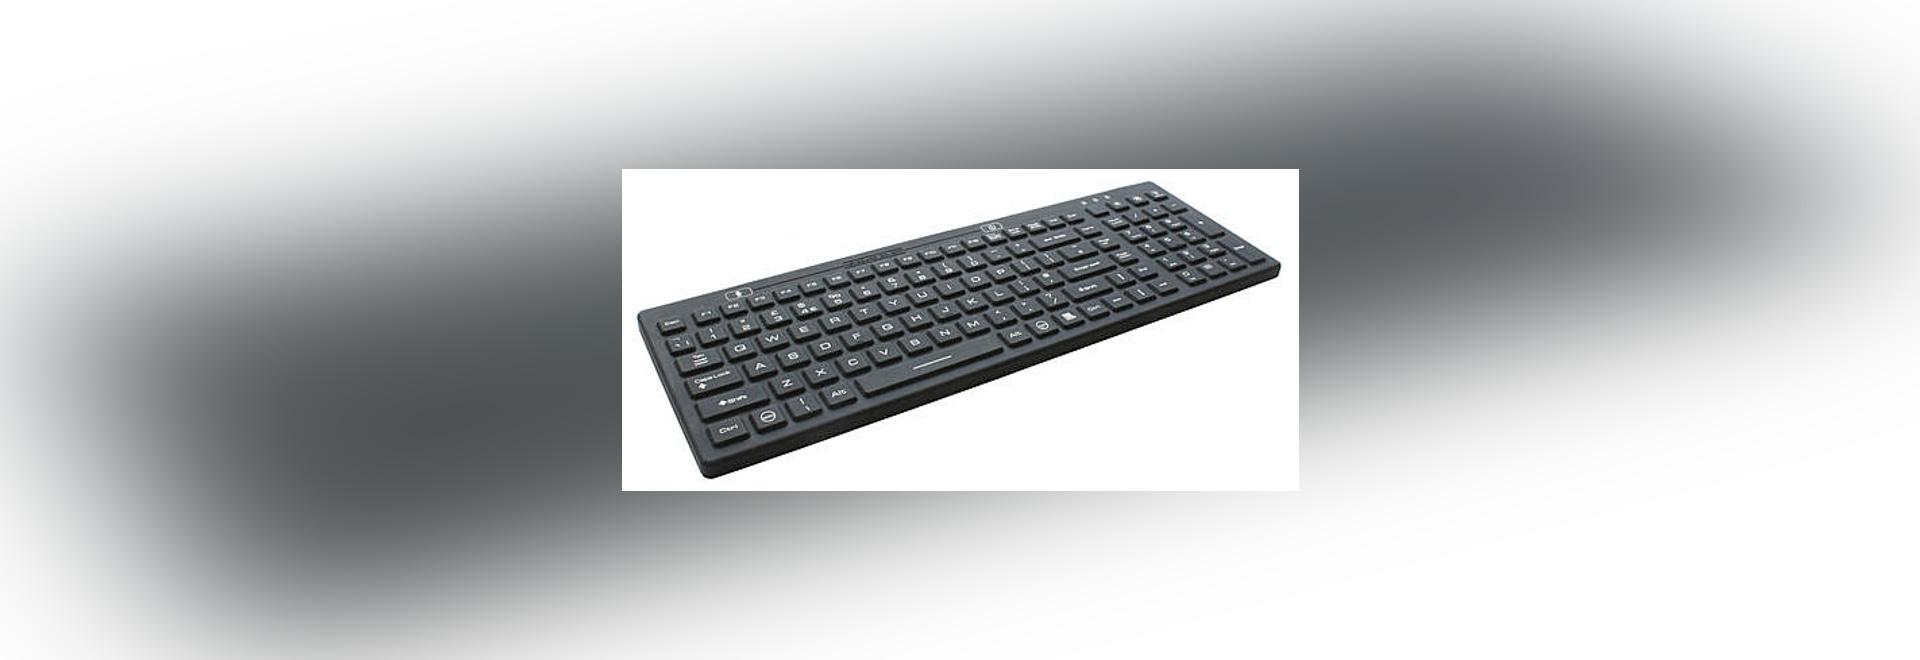 LED Backlit Keyboard Illuminates In Low Light Working Environments